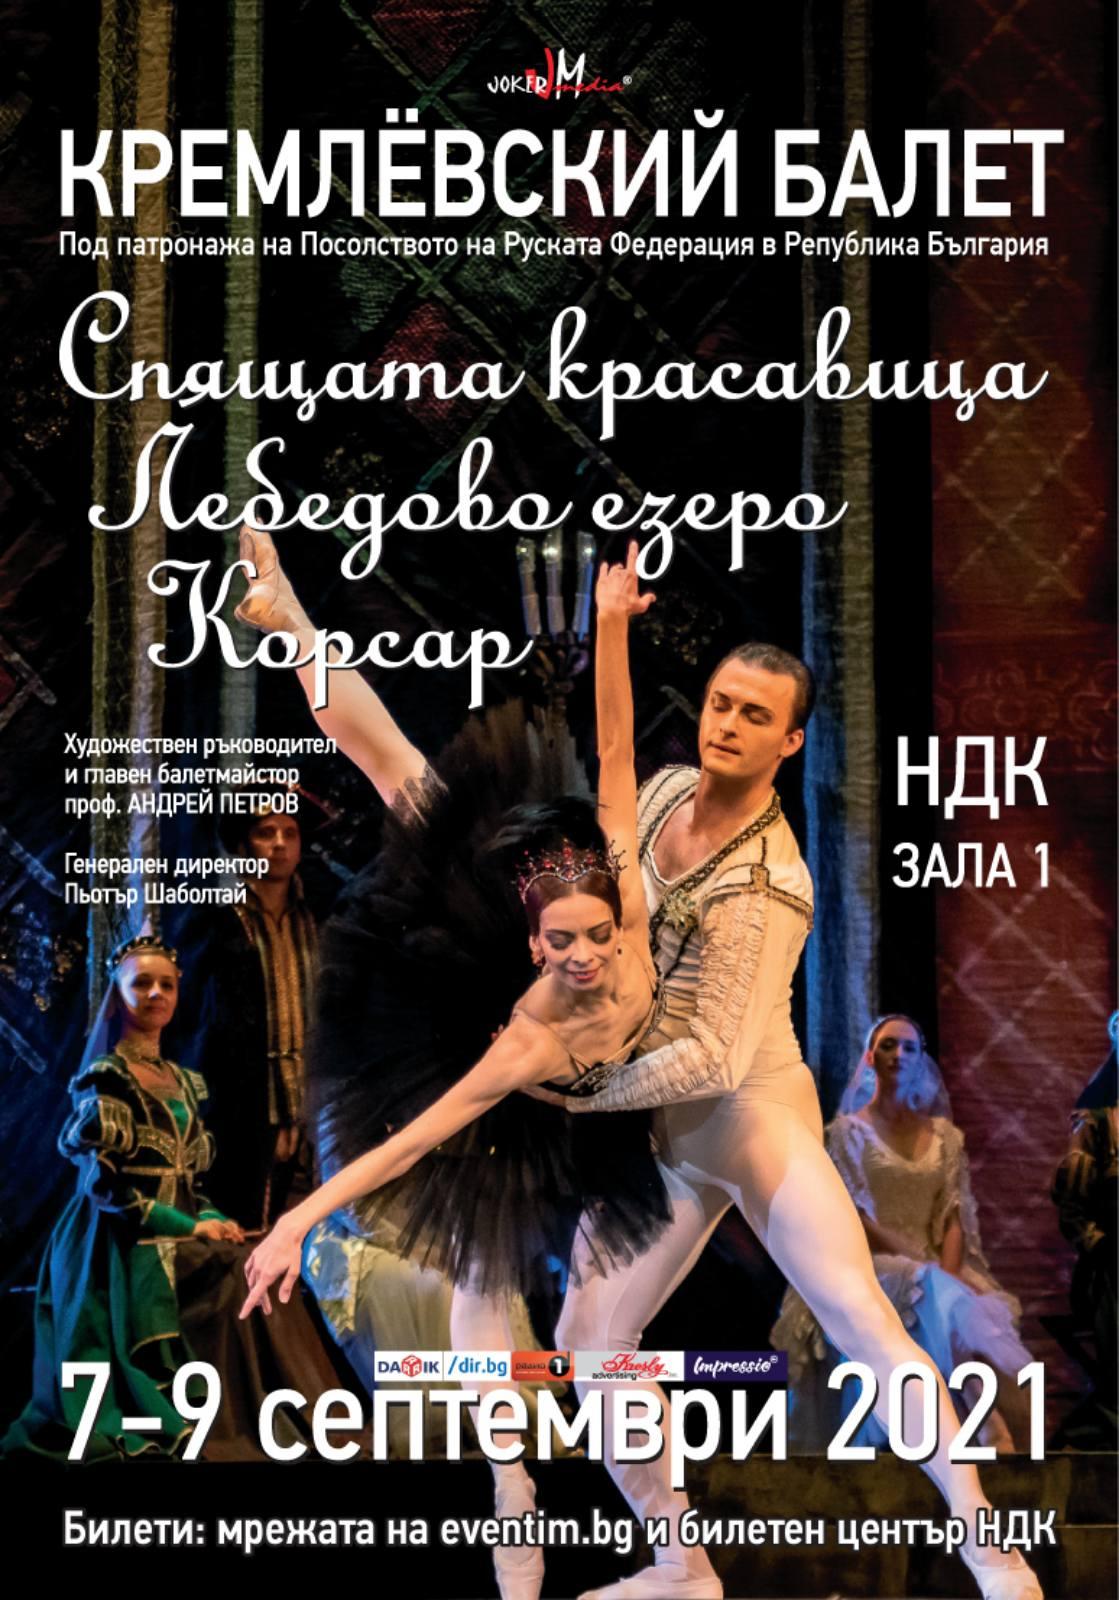 КРЕМЪЛСКИ БАЛЕТ – НДК, 7 – 9 септември 2021 година